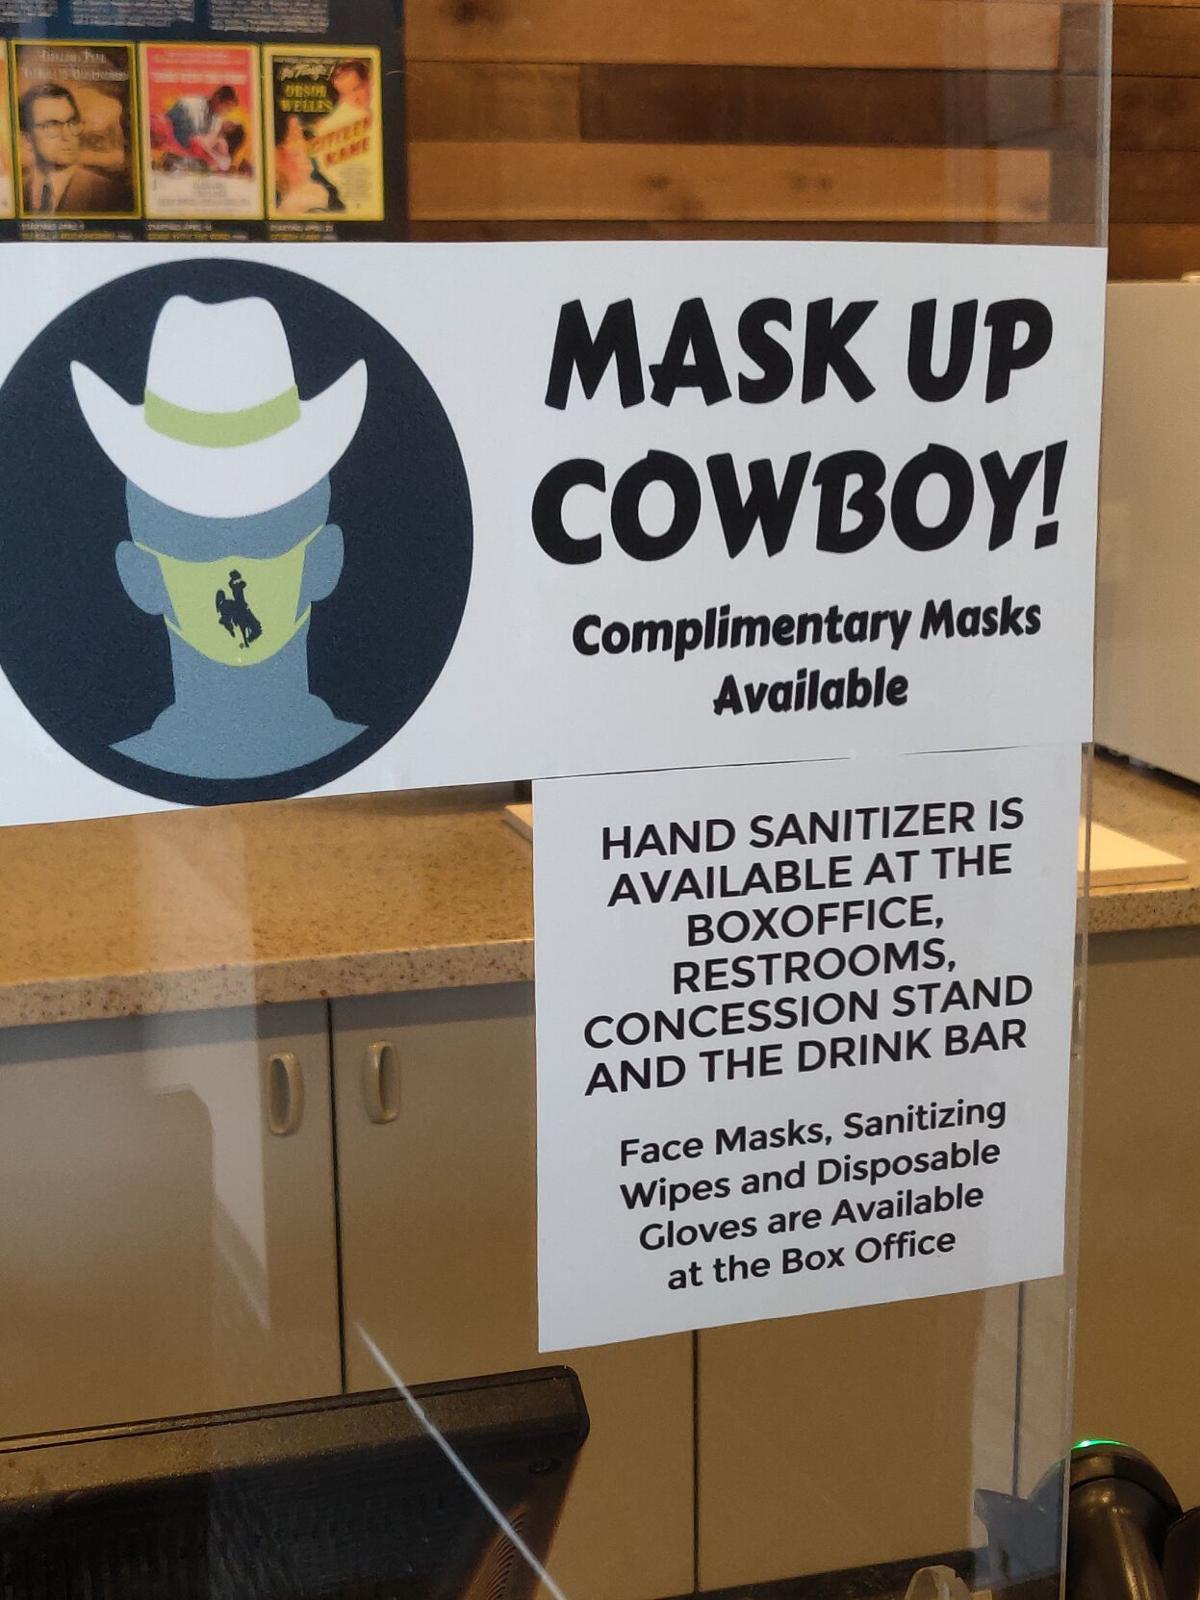 Mask Up Cowboy sign photo